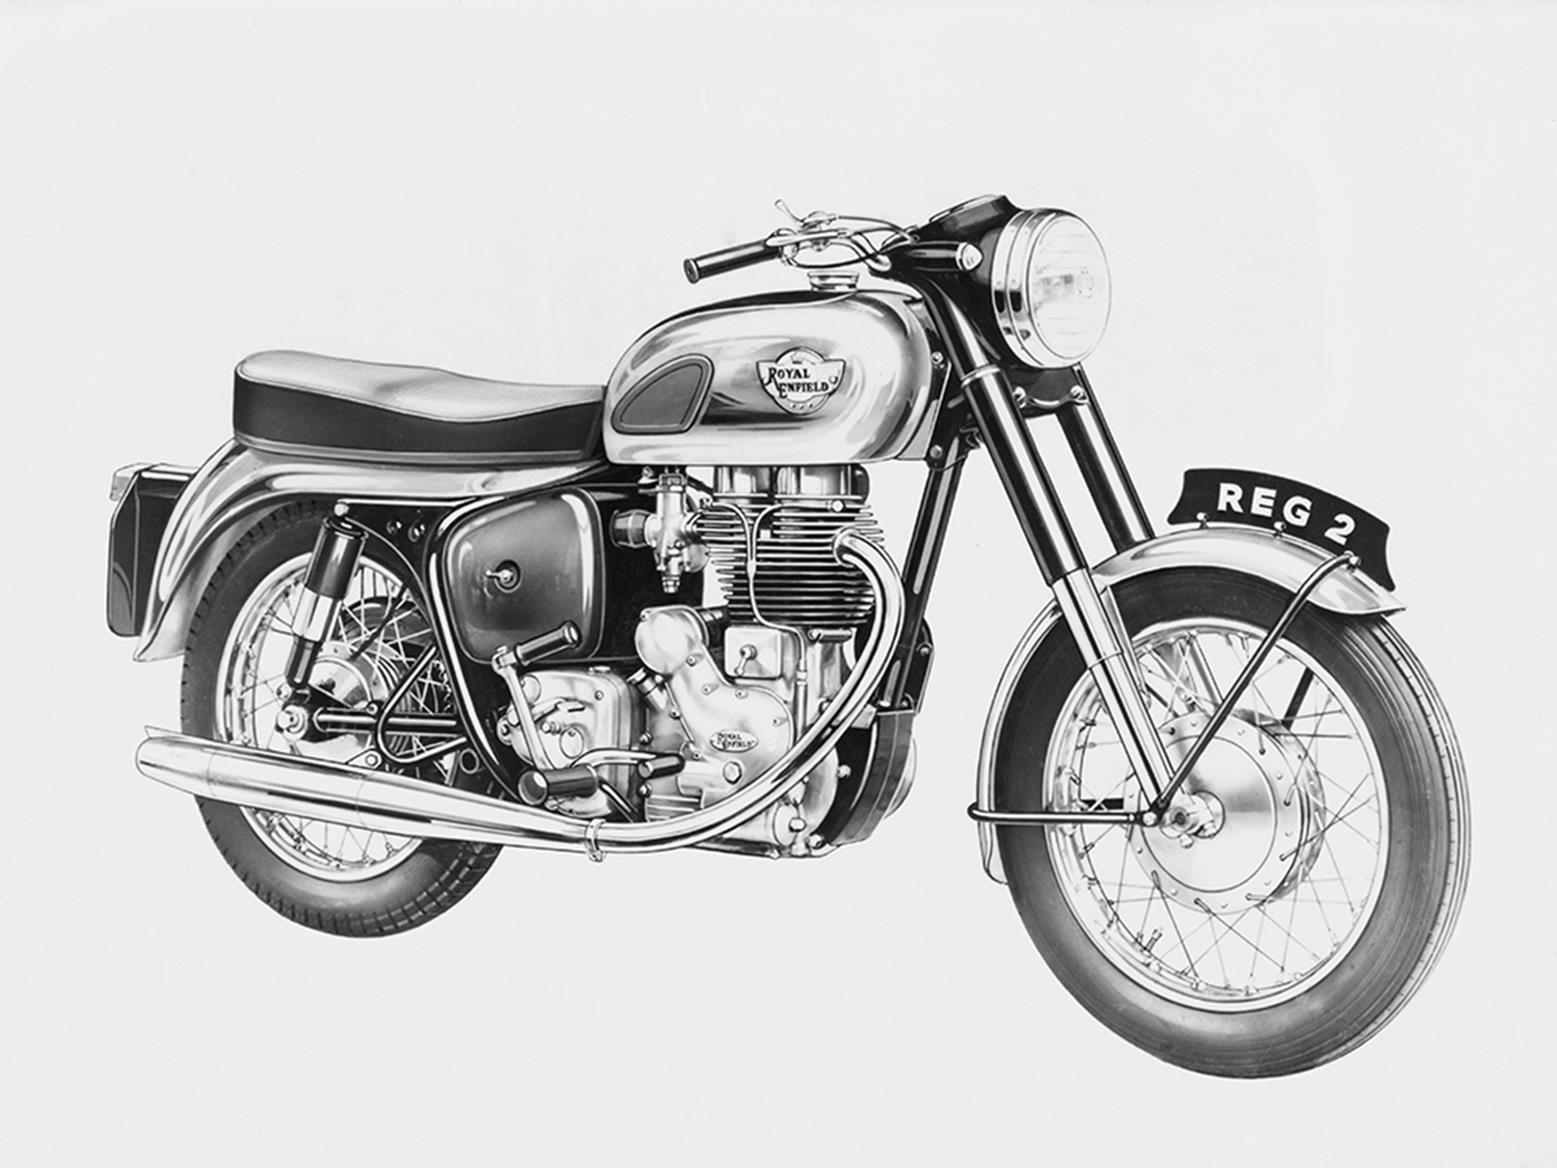 1932 Royal Enfield Bullet 350